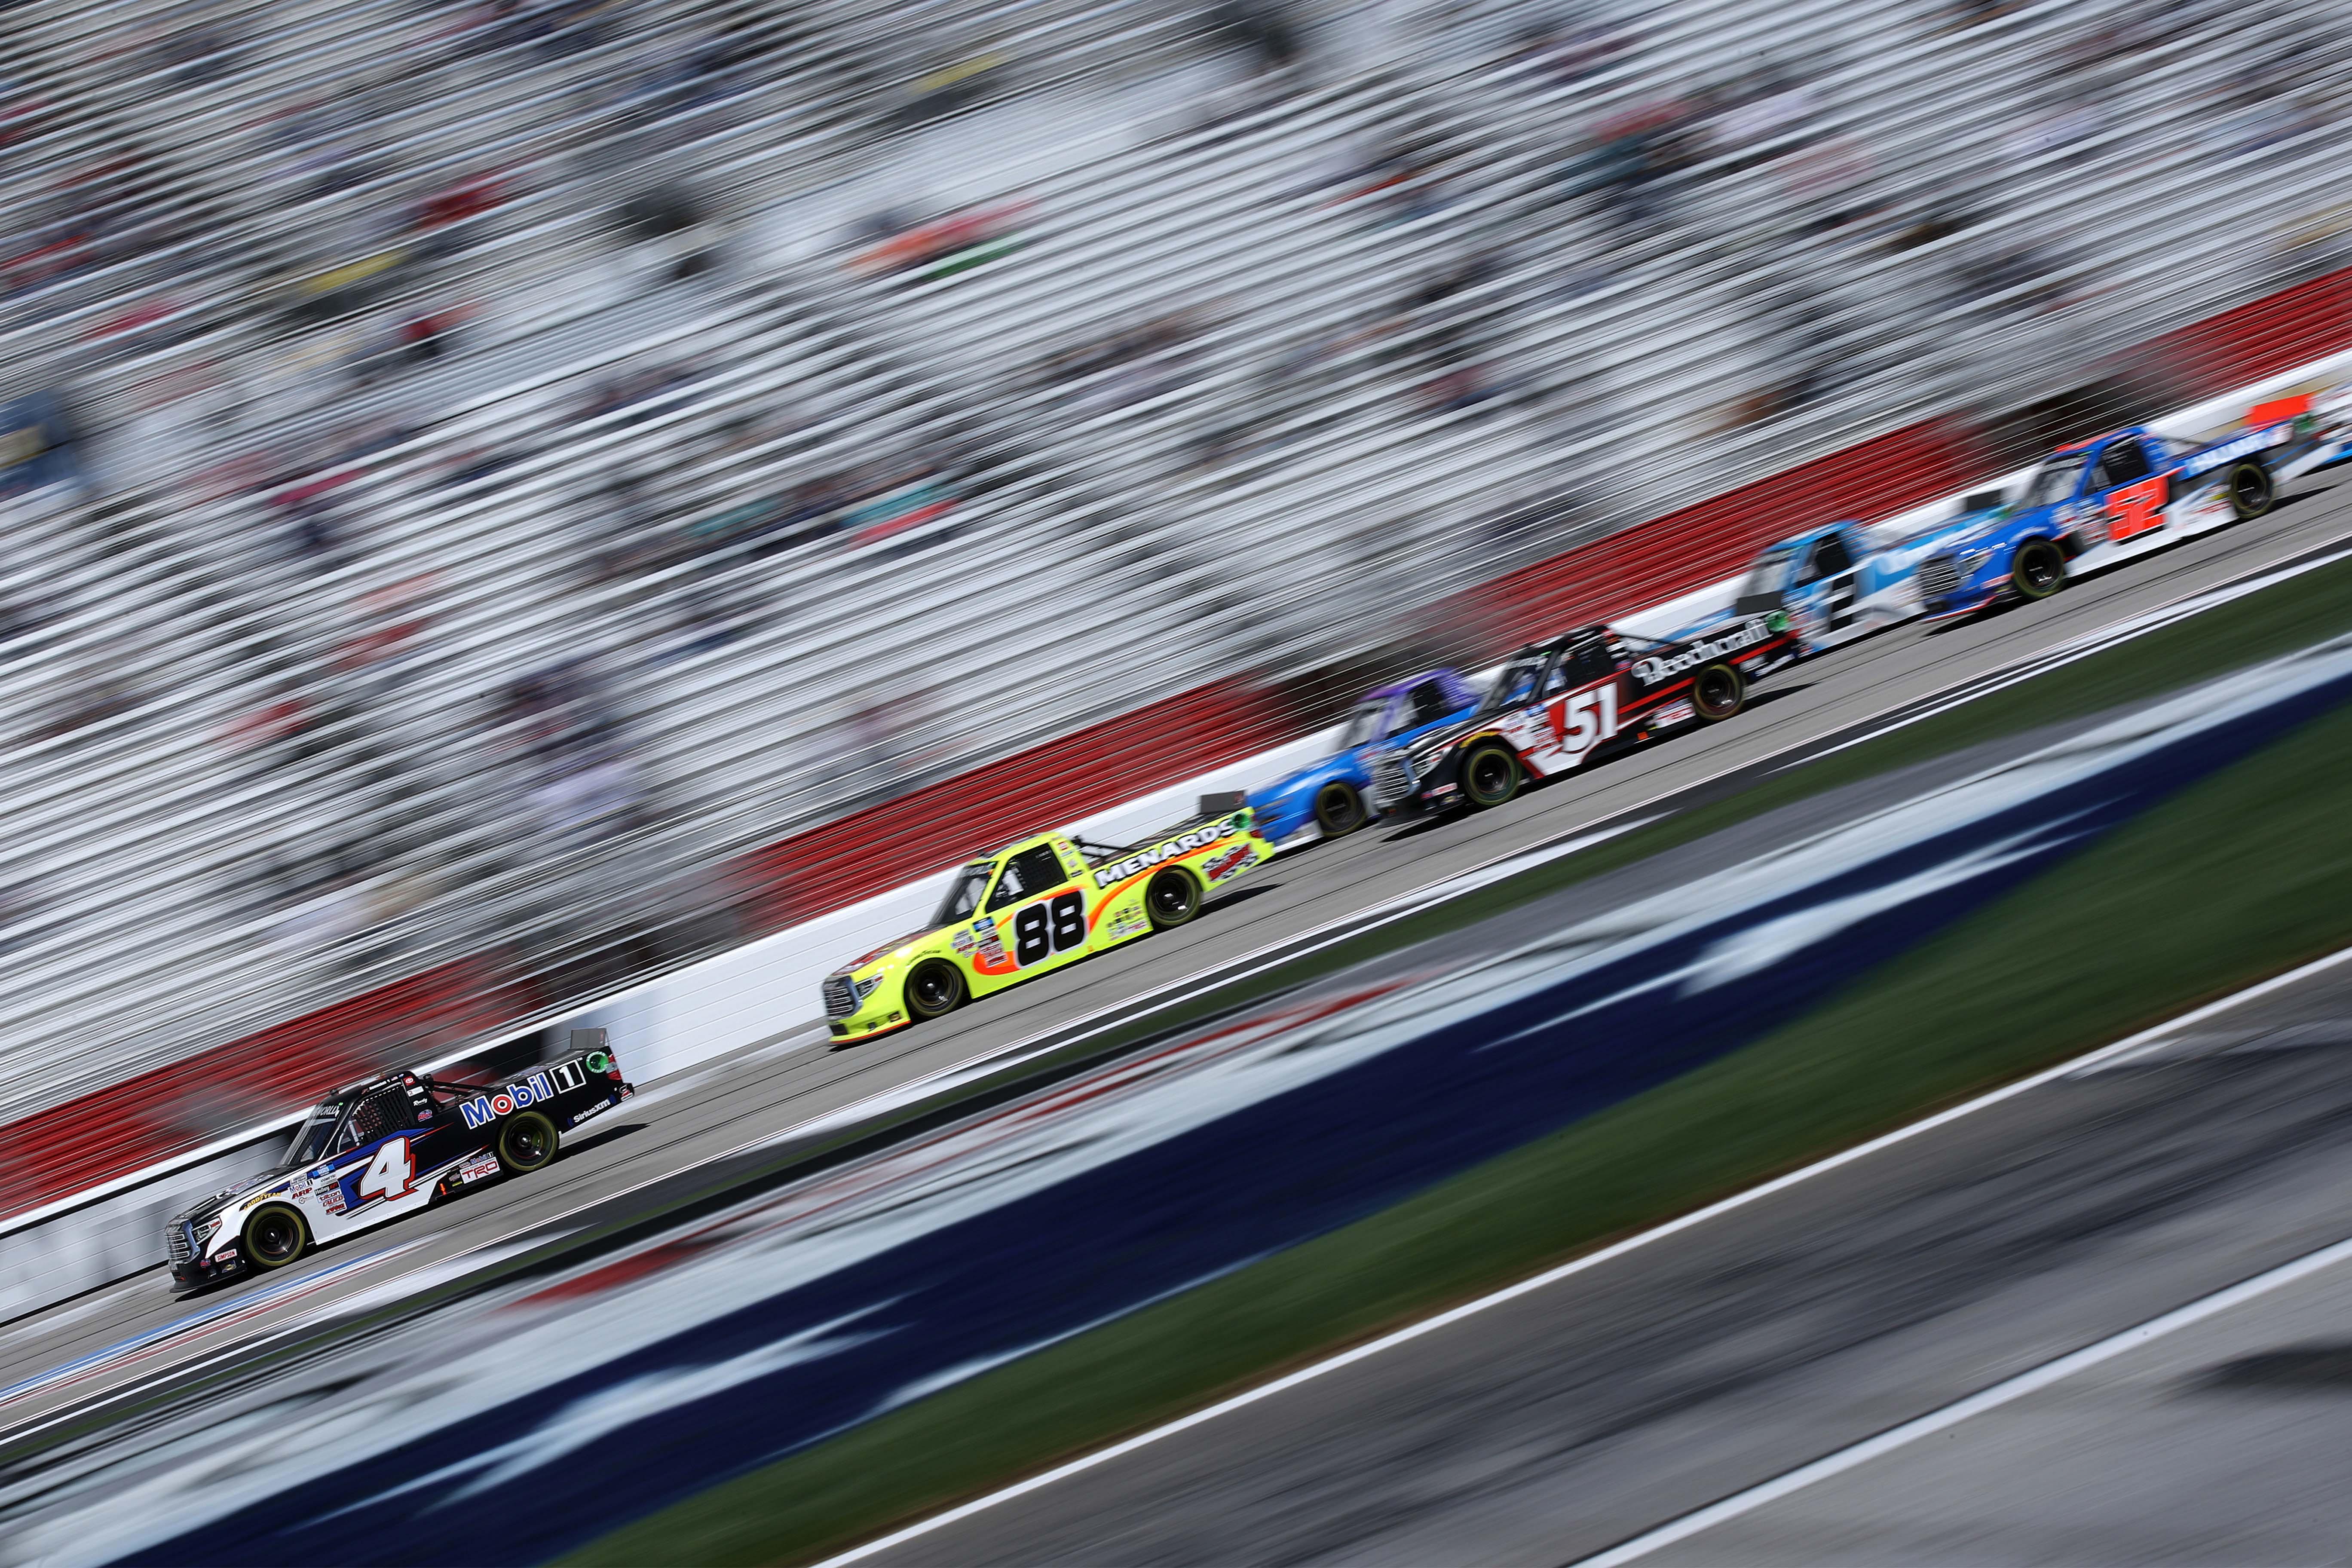 John Hunter Nemechek, Matt Crafton - Atlanta Motor Speedway - NASCAR Truck Series